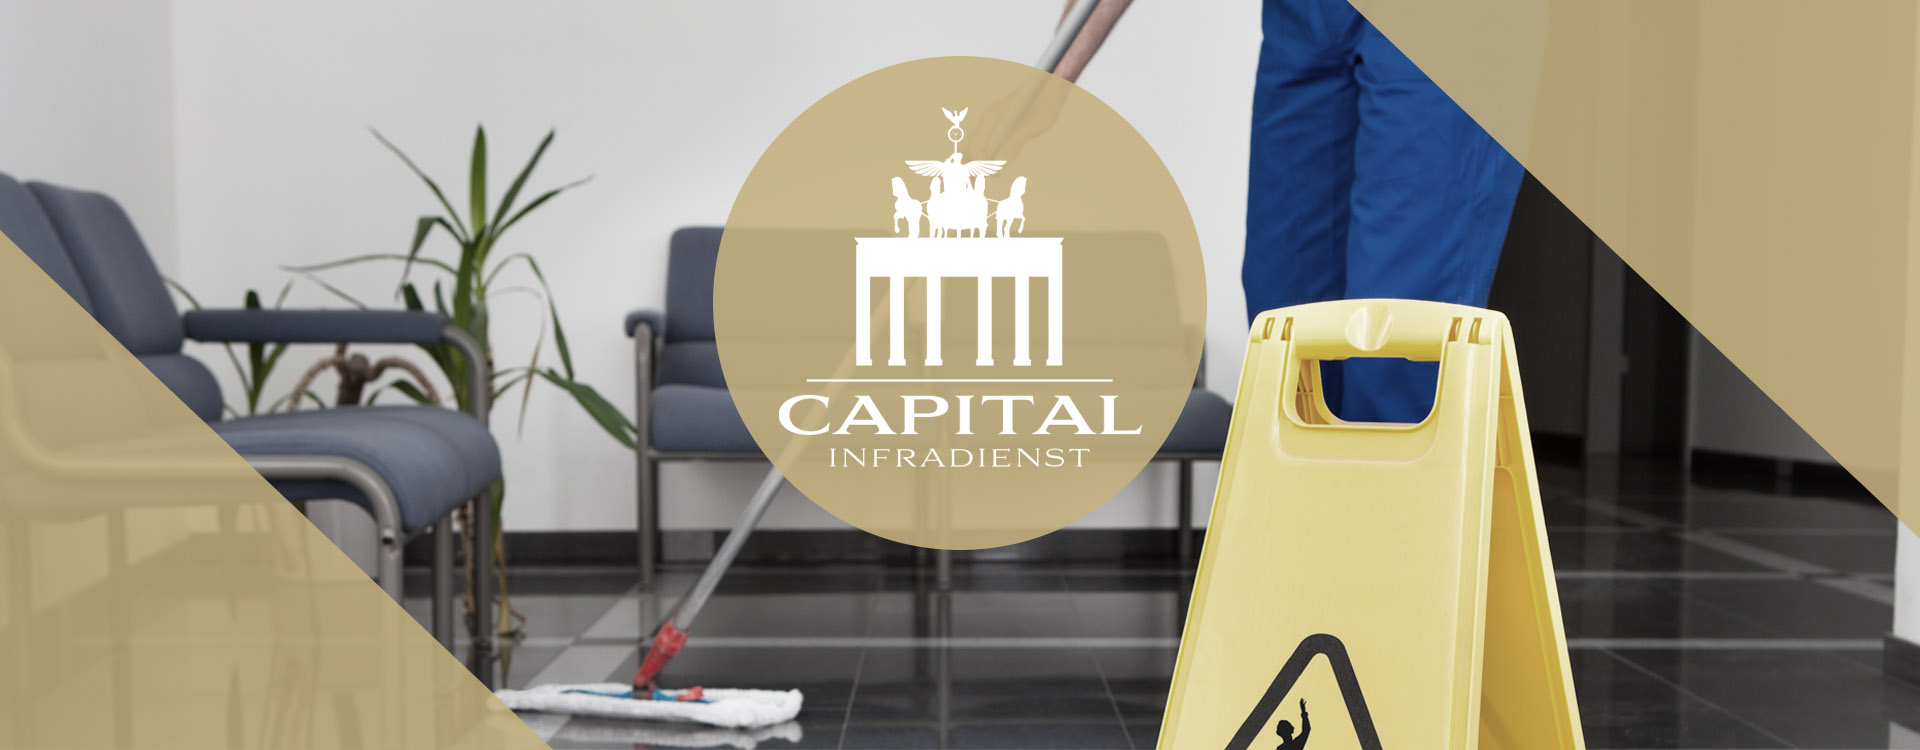 capital-infradienst-slider-jobs